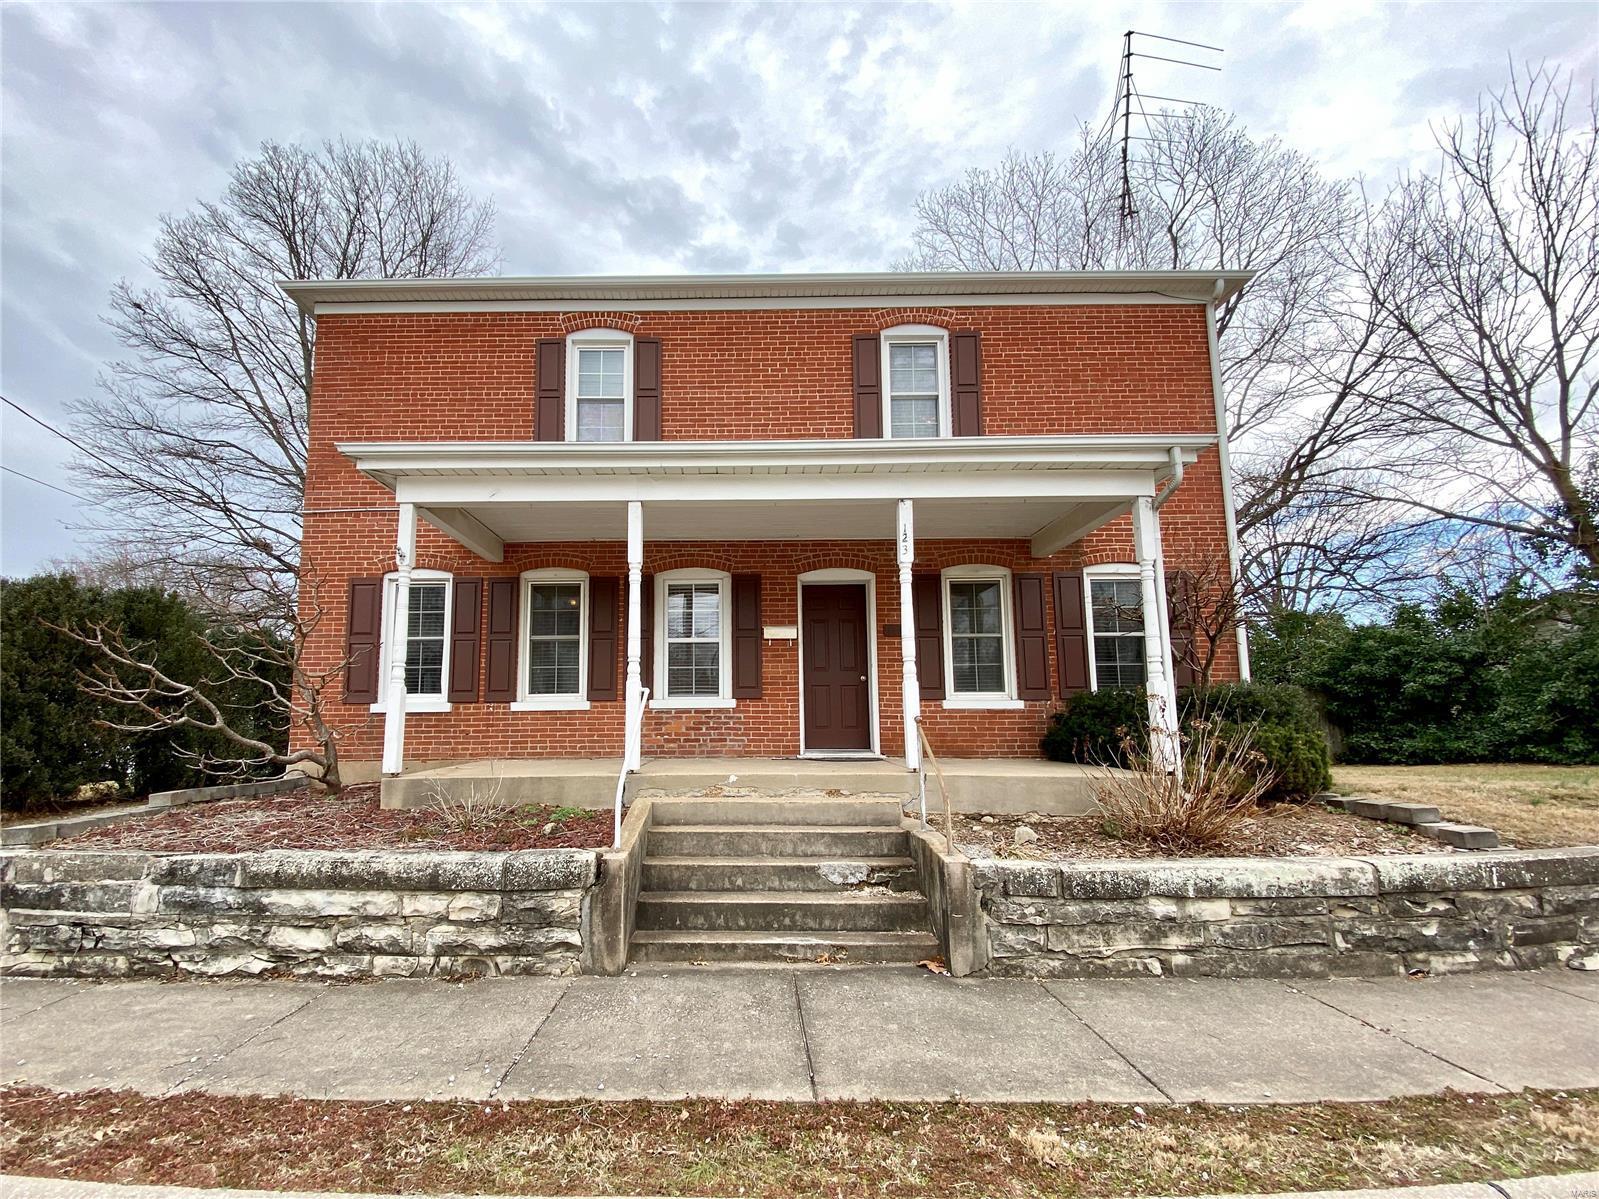 123 S Jackson Property Photo